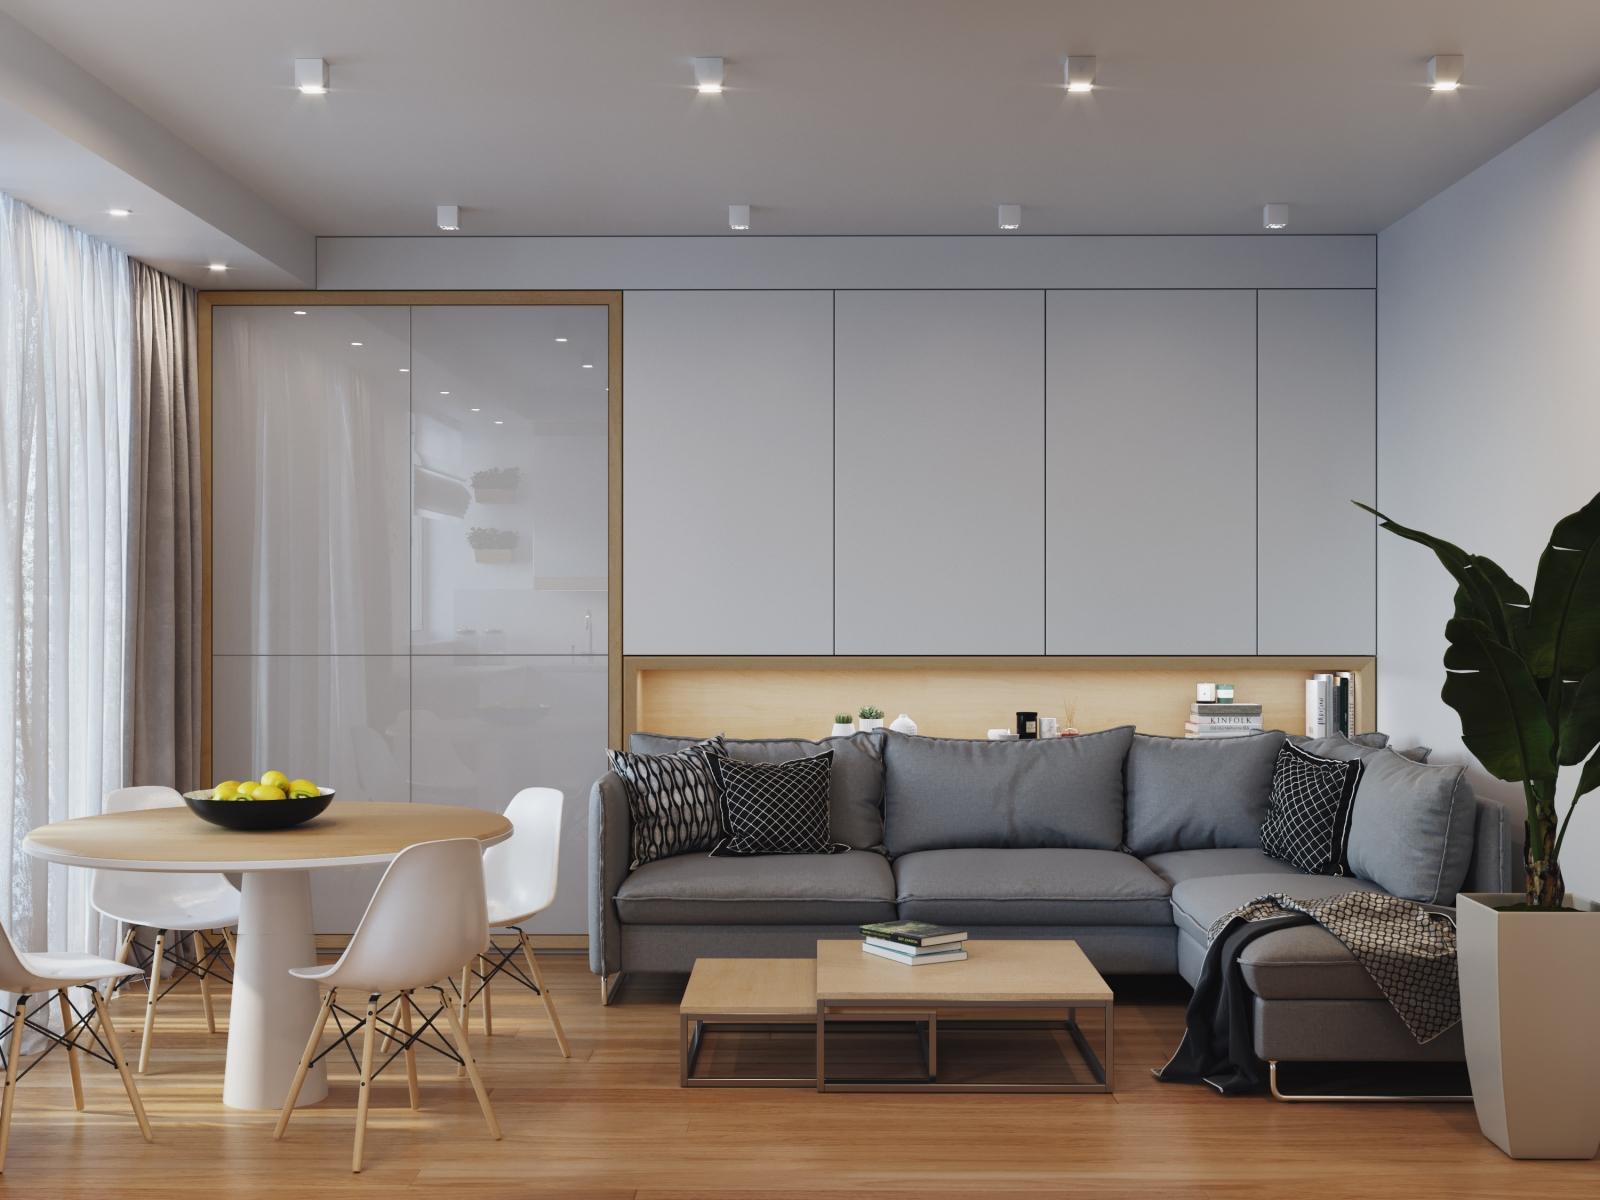 White and Grey Interior Visualization